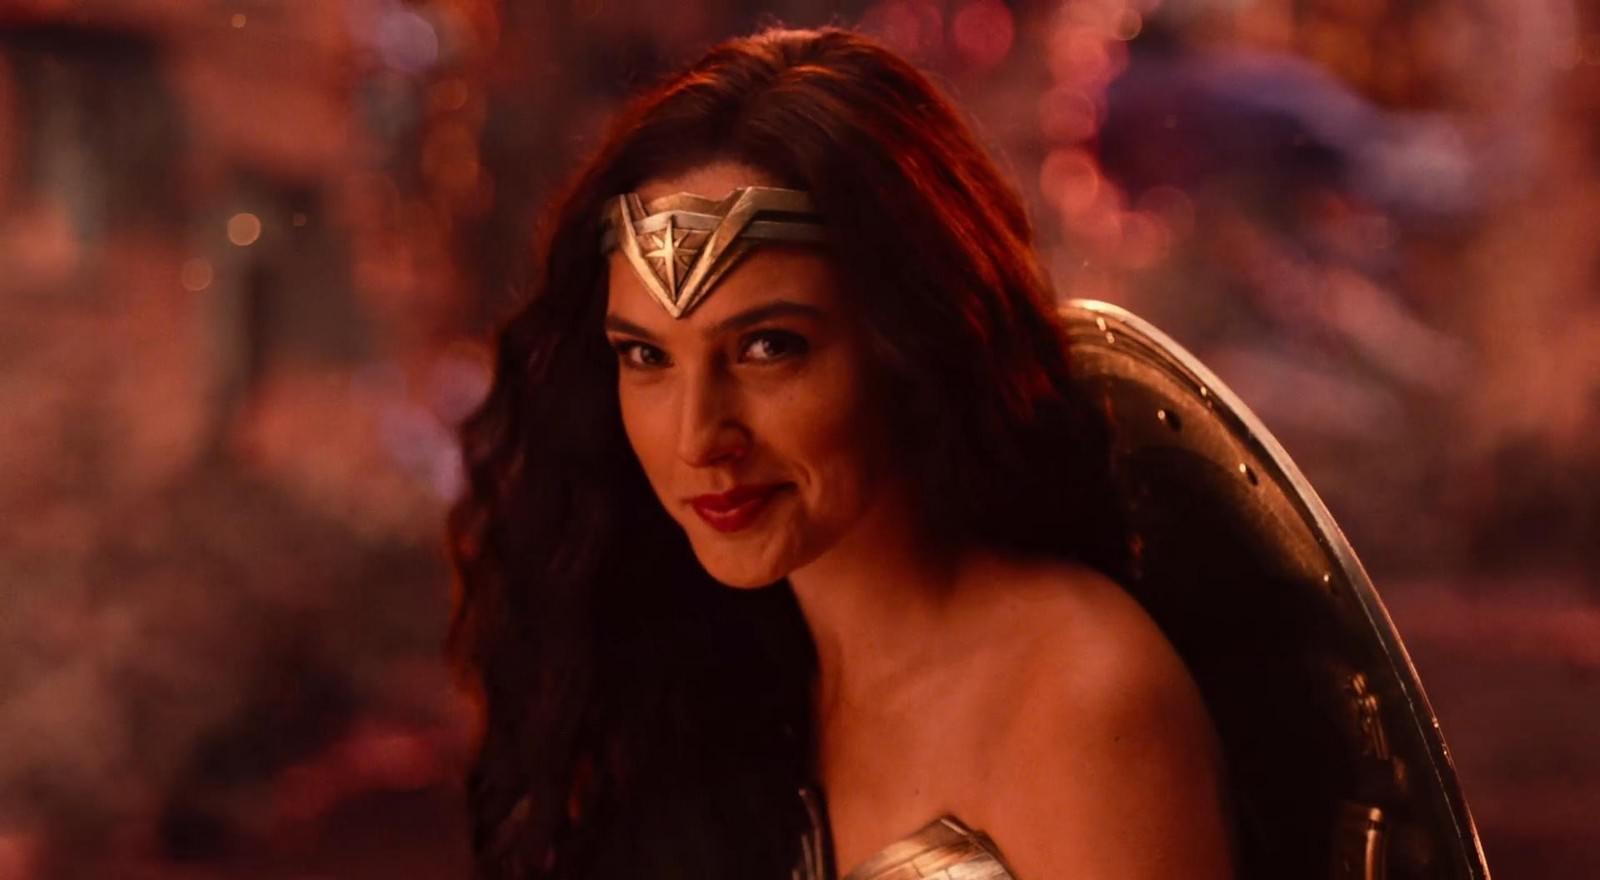 Movie, Justice League(美國, 2017年) / 正義聯盟(台灣.香港) / 正义联盟(中國), 電影劇照, 角色與演員介紹